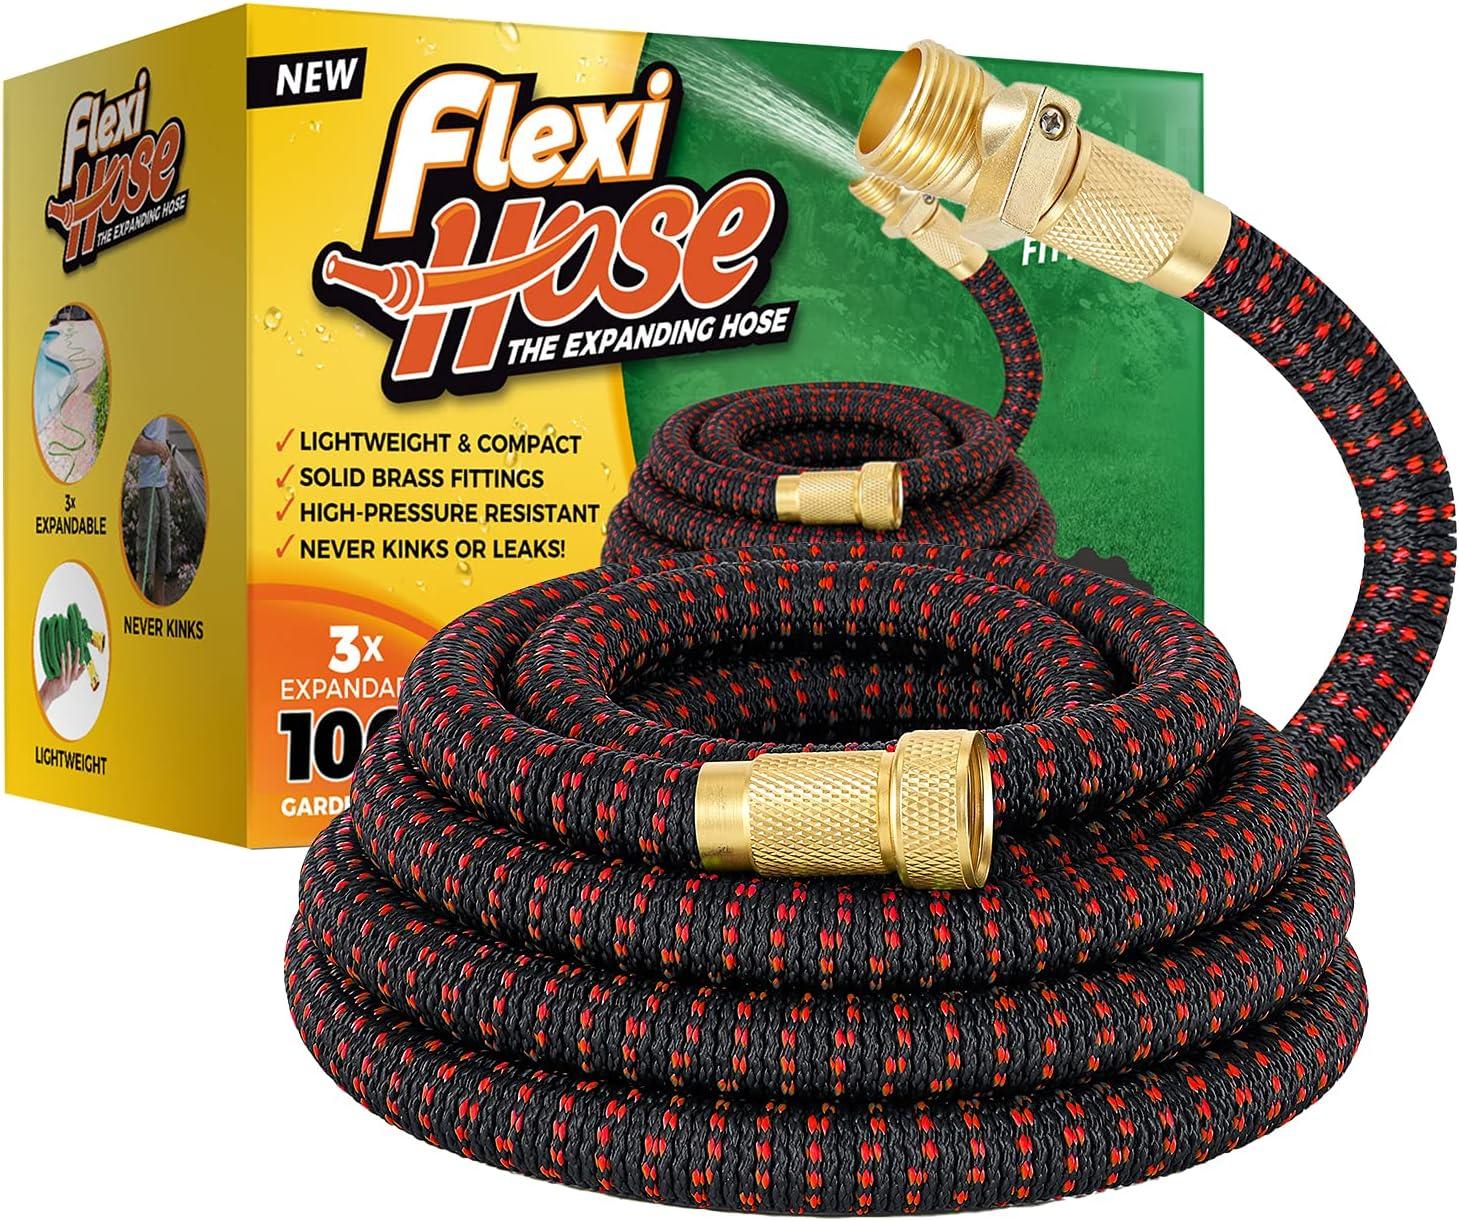 Flexi Hose Lightweight Expandable Max 85% OFF Flexibili 4 years warranty Garden No-Kink